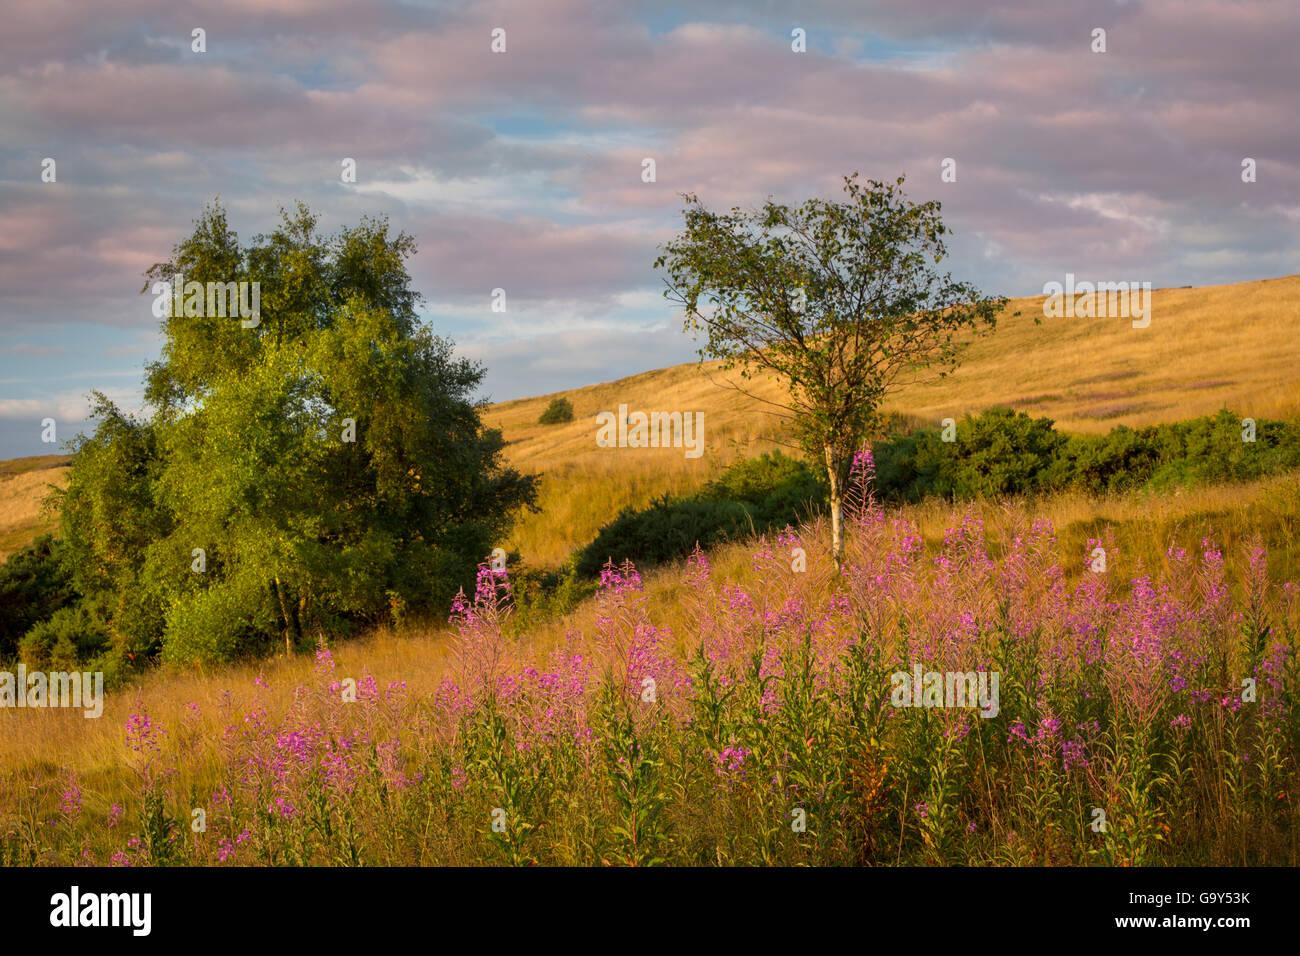 Dawn over Arthur's Seat hillside, Edinburgh, Lothian, Scotland - Stock Image